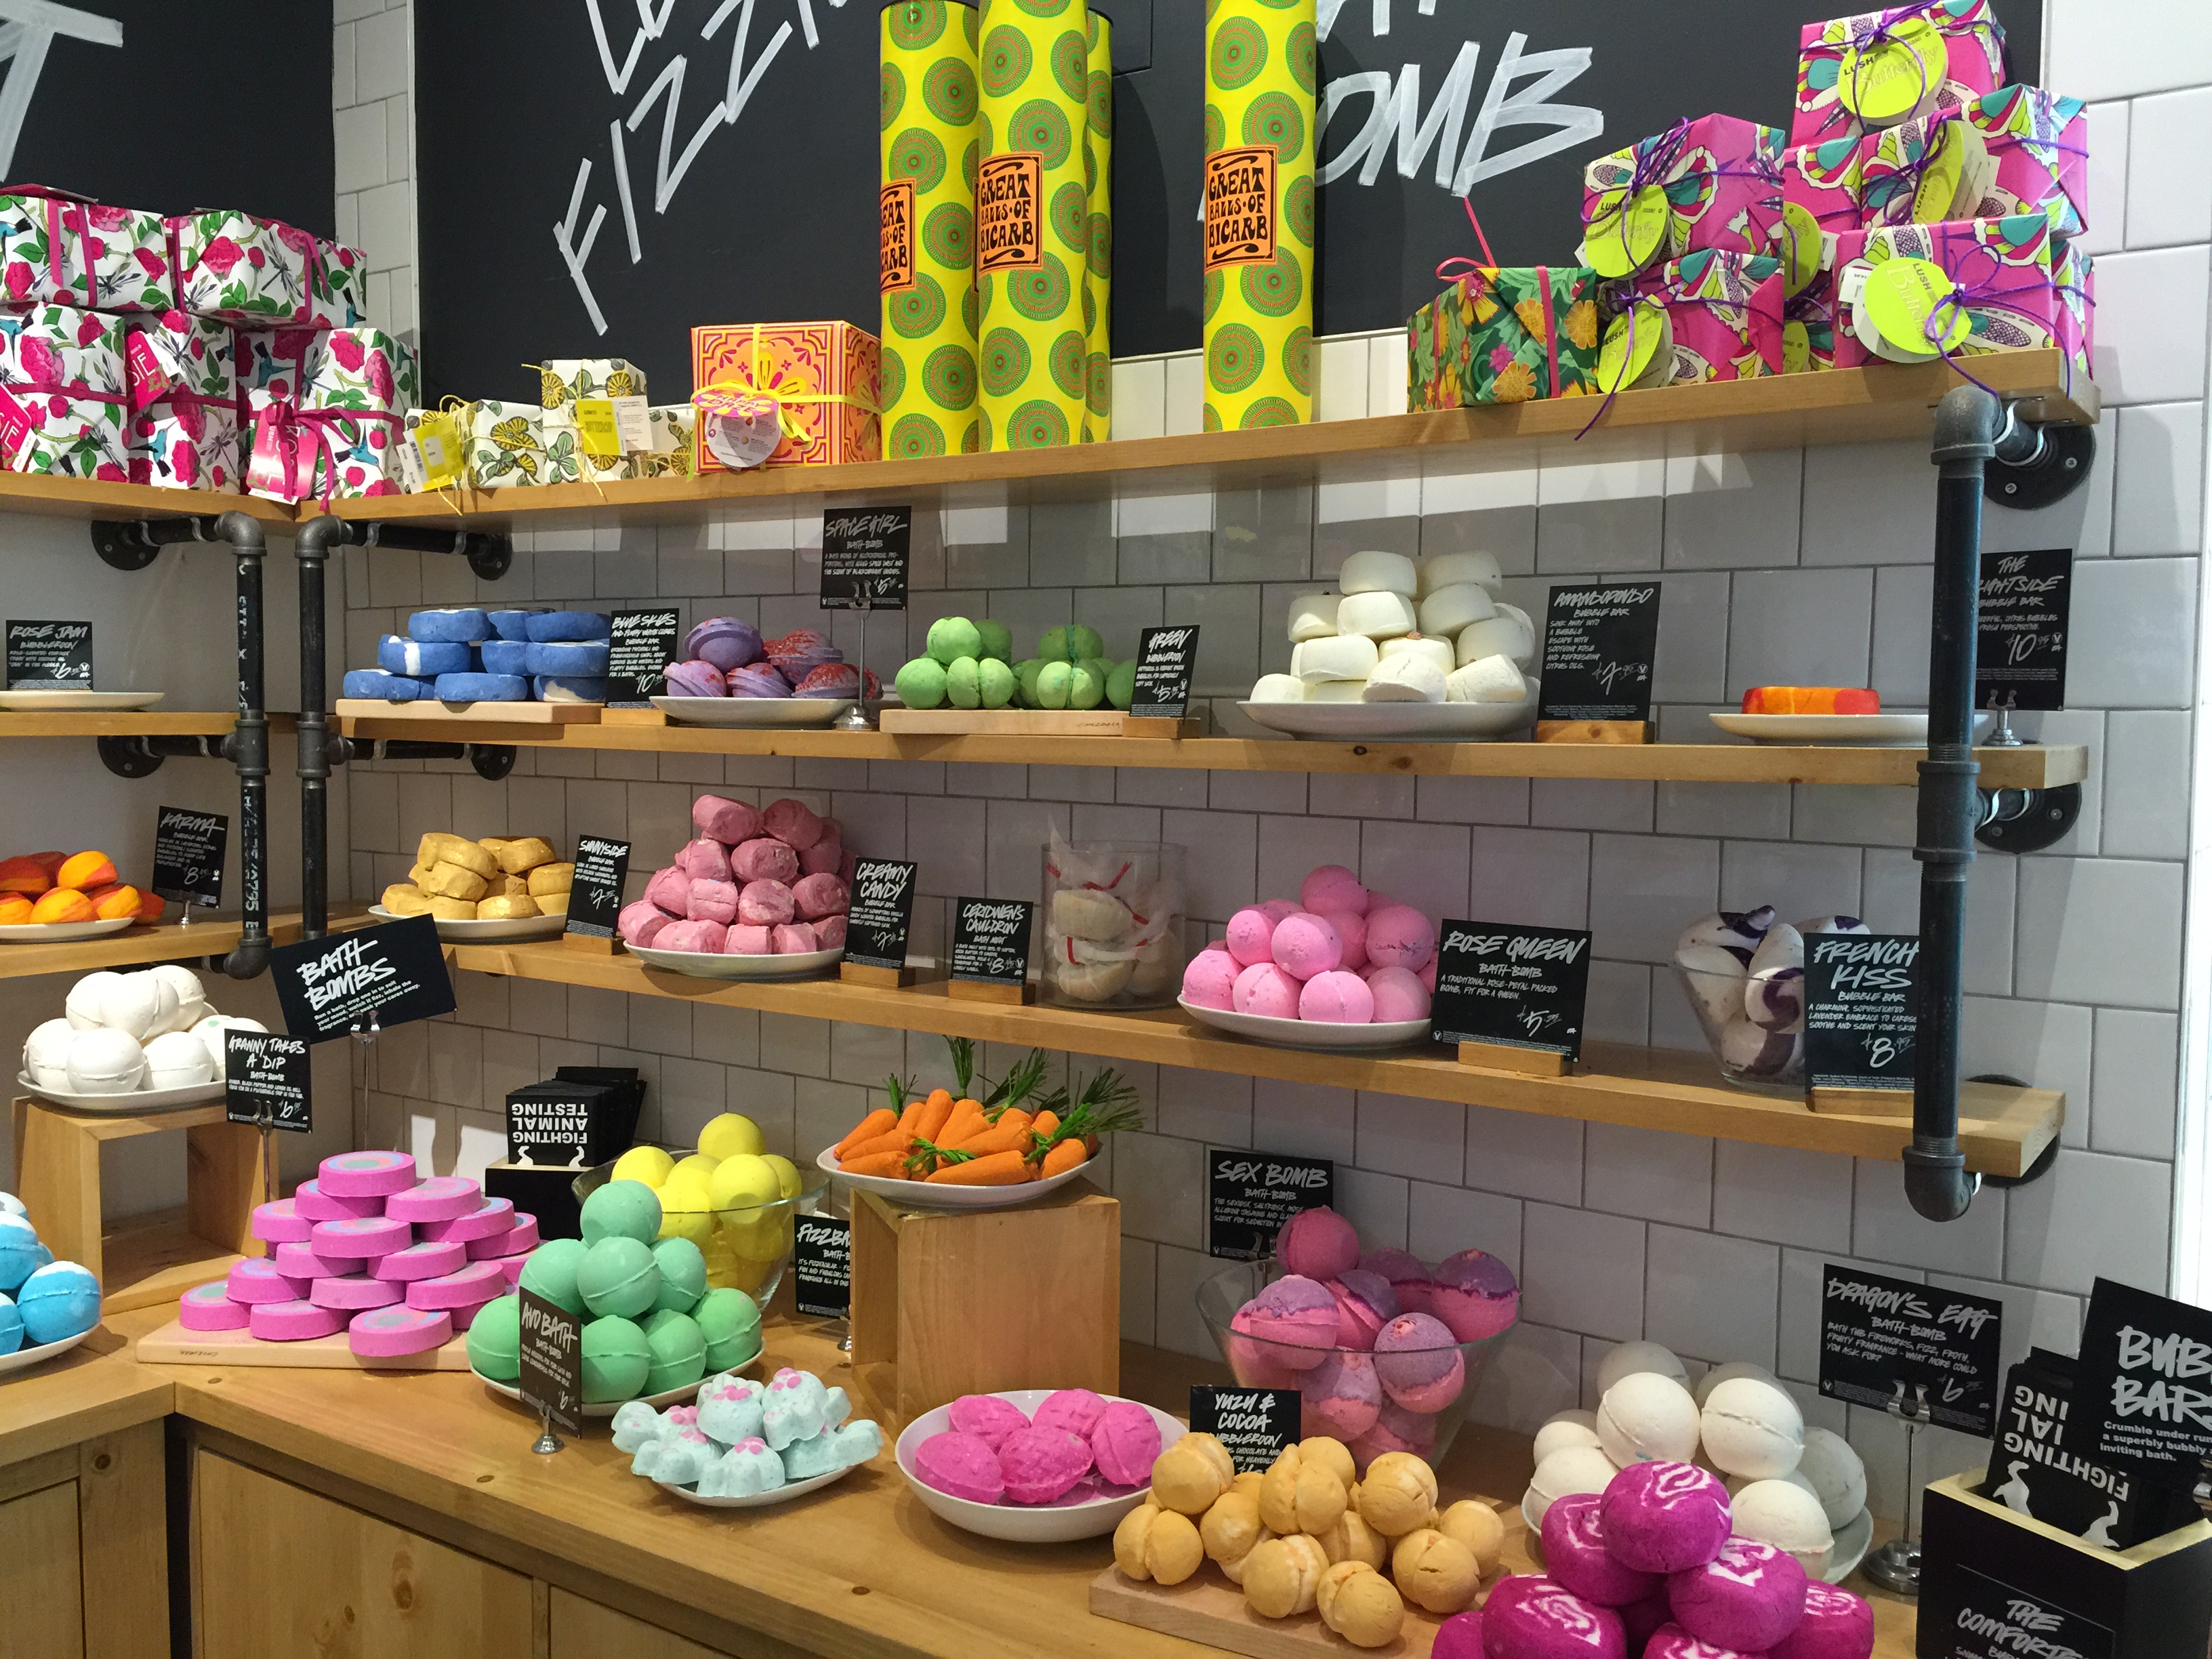 LUSH Fresh Handmade Cosmetics - 14 Photos & 15 Reviews